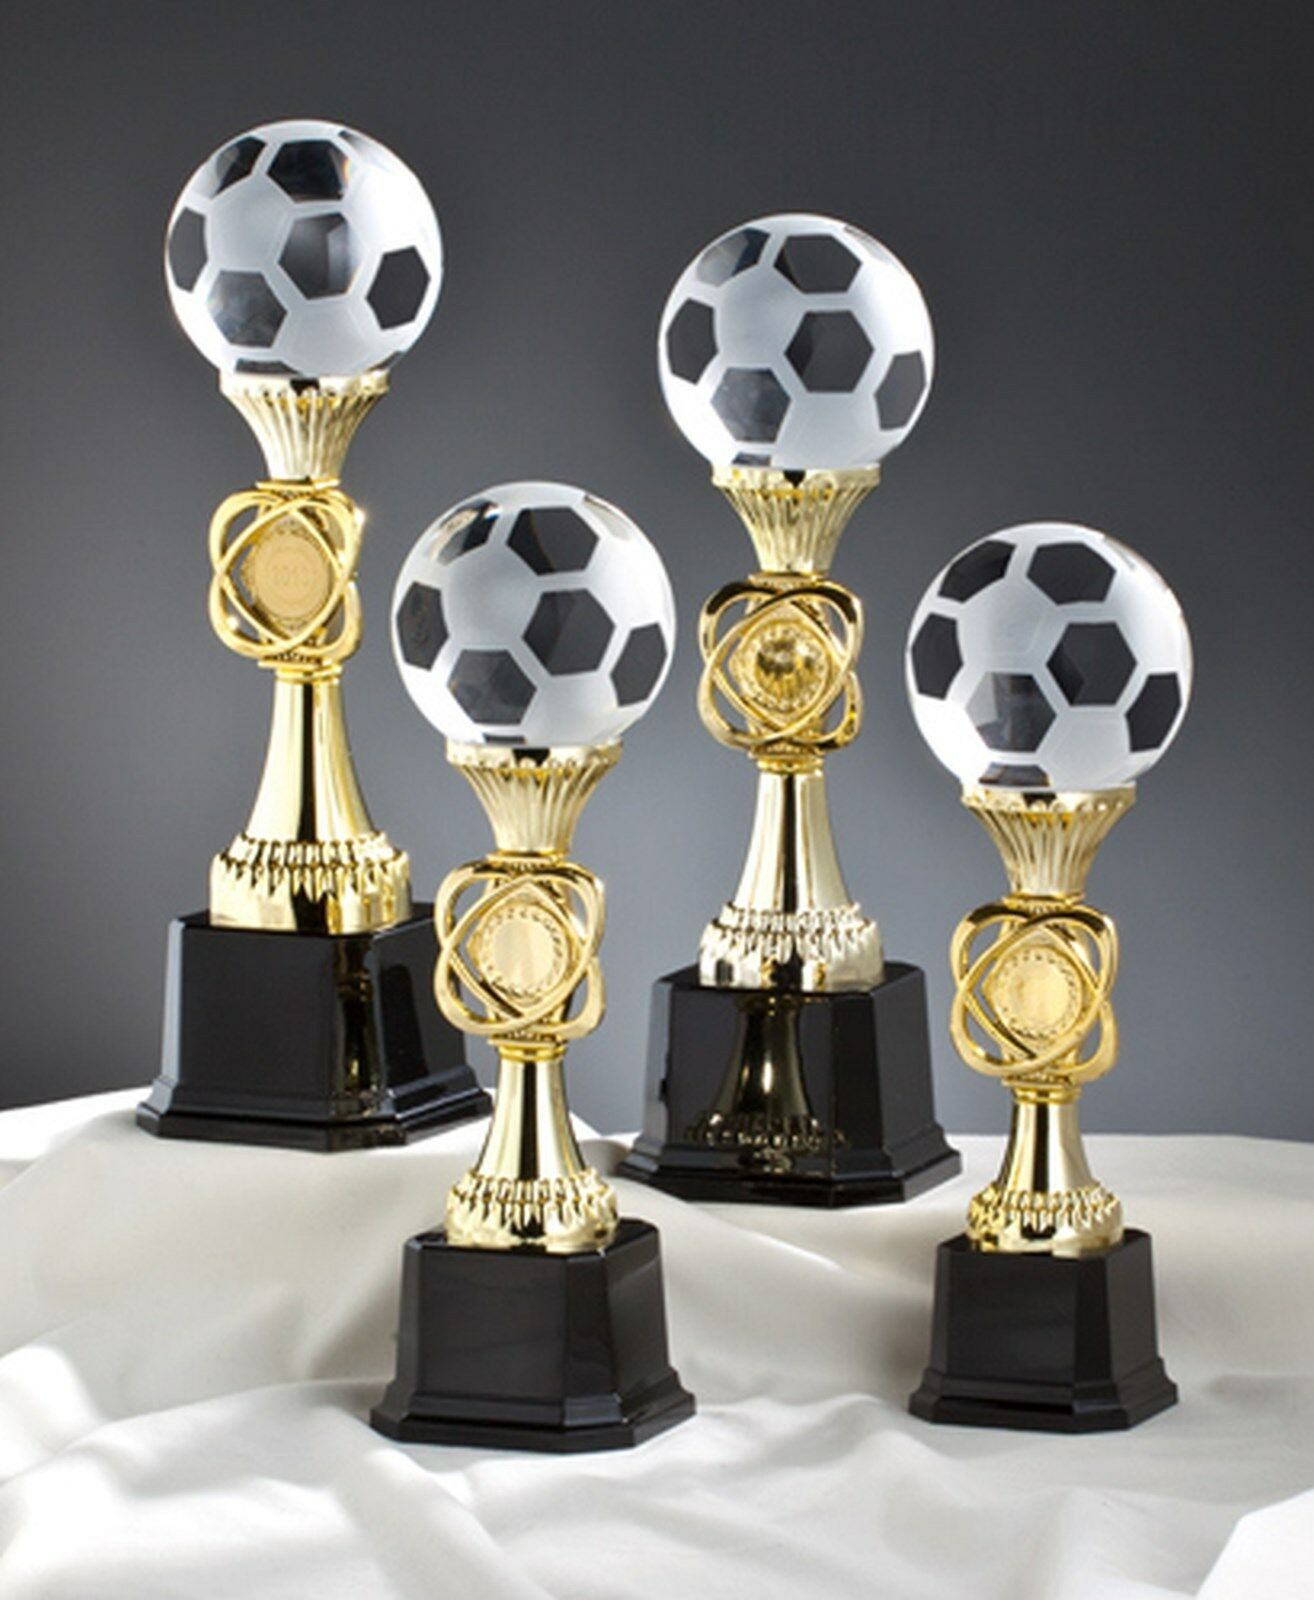 1 Glaspokal Fußball Noblesseglas 26cm 26cm 26cm mit Gravur  2 (Glaspokal Sieger) b32f26